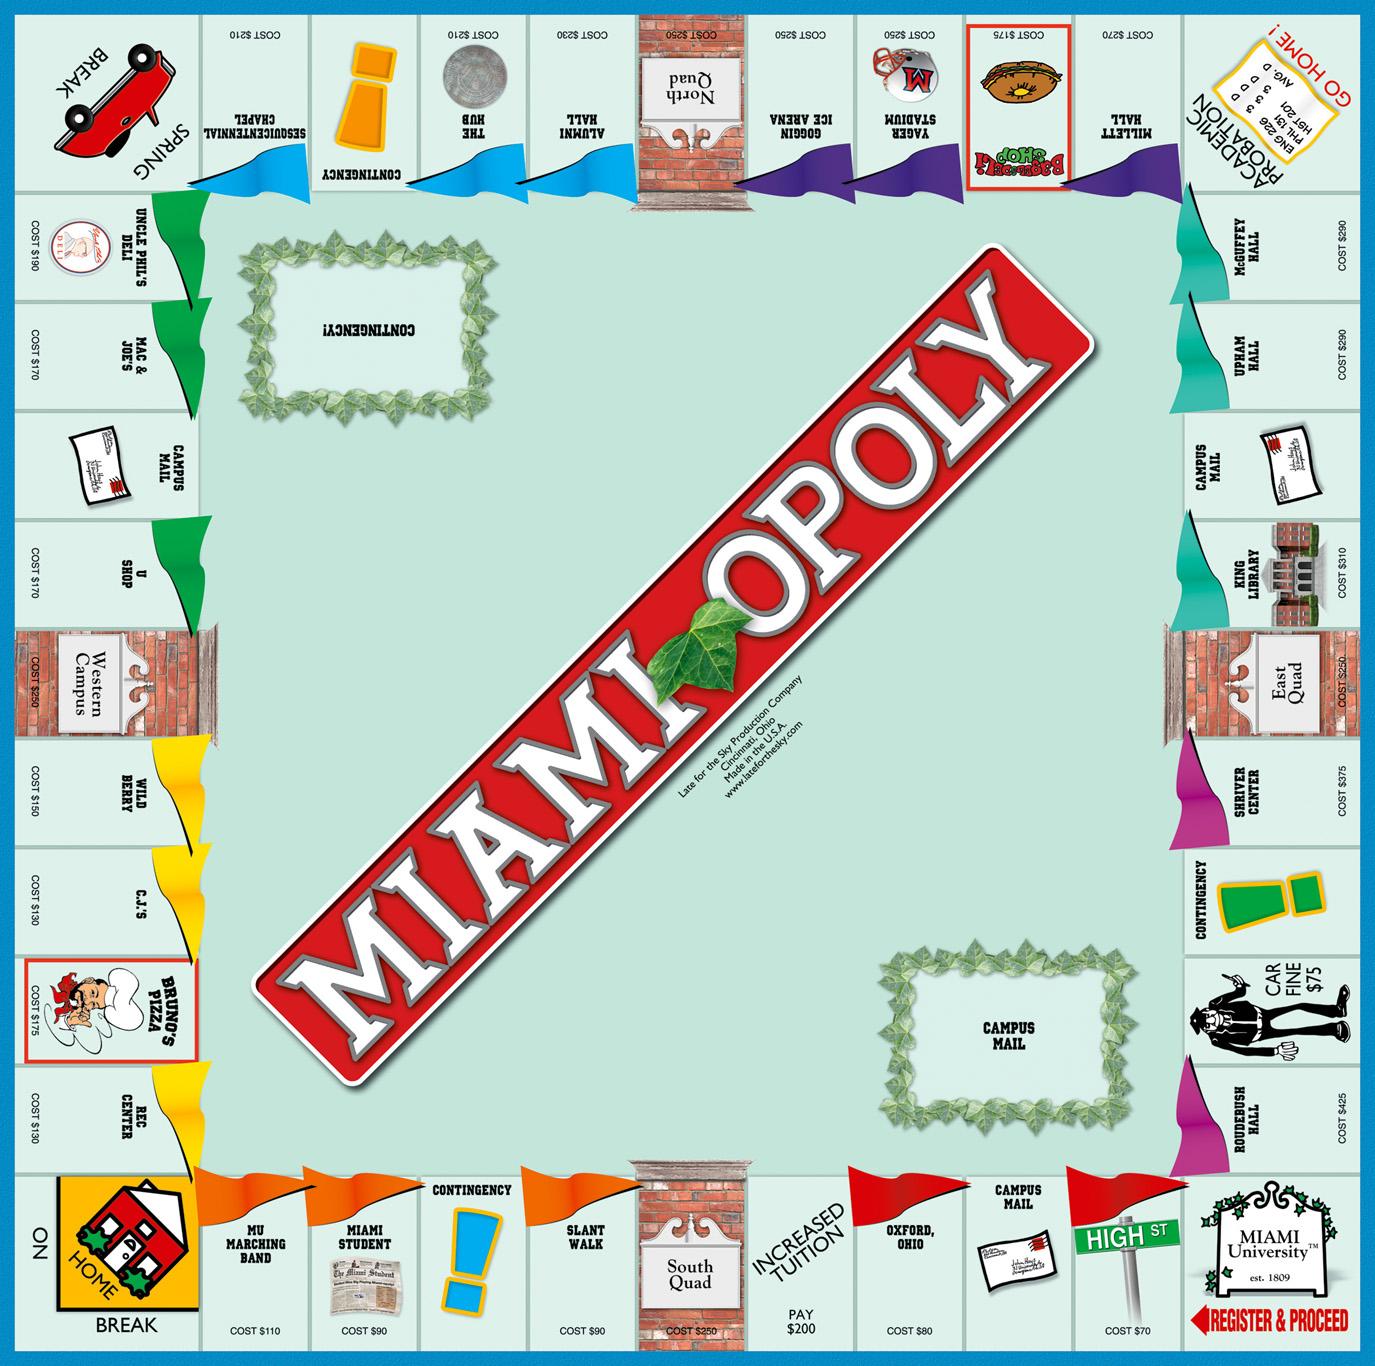 MIAMIOPOLY Board Game